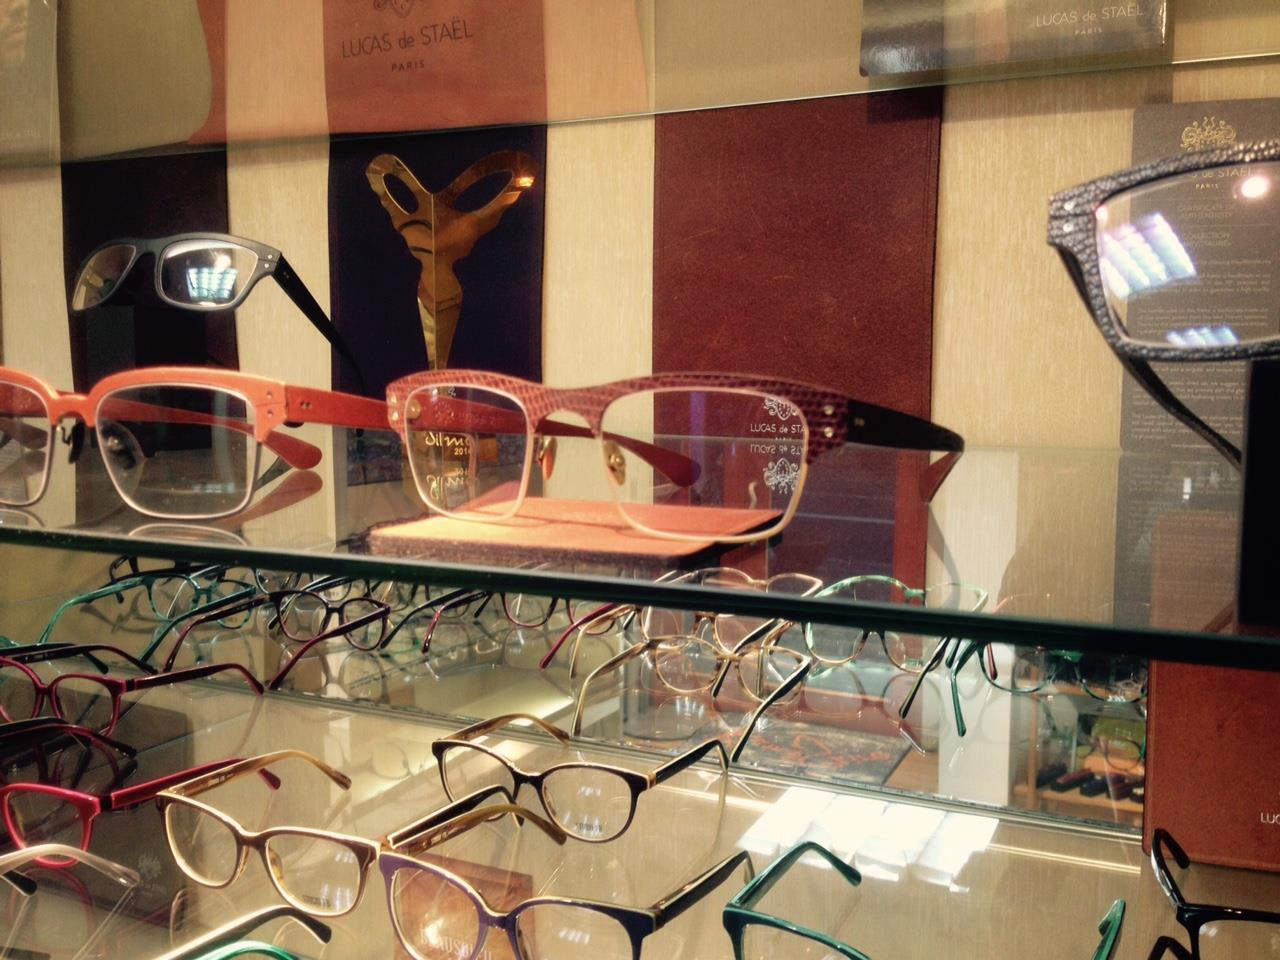 LACAS de STAEL レザーフレーム眼鏡 100,000円